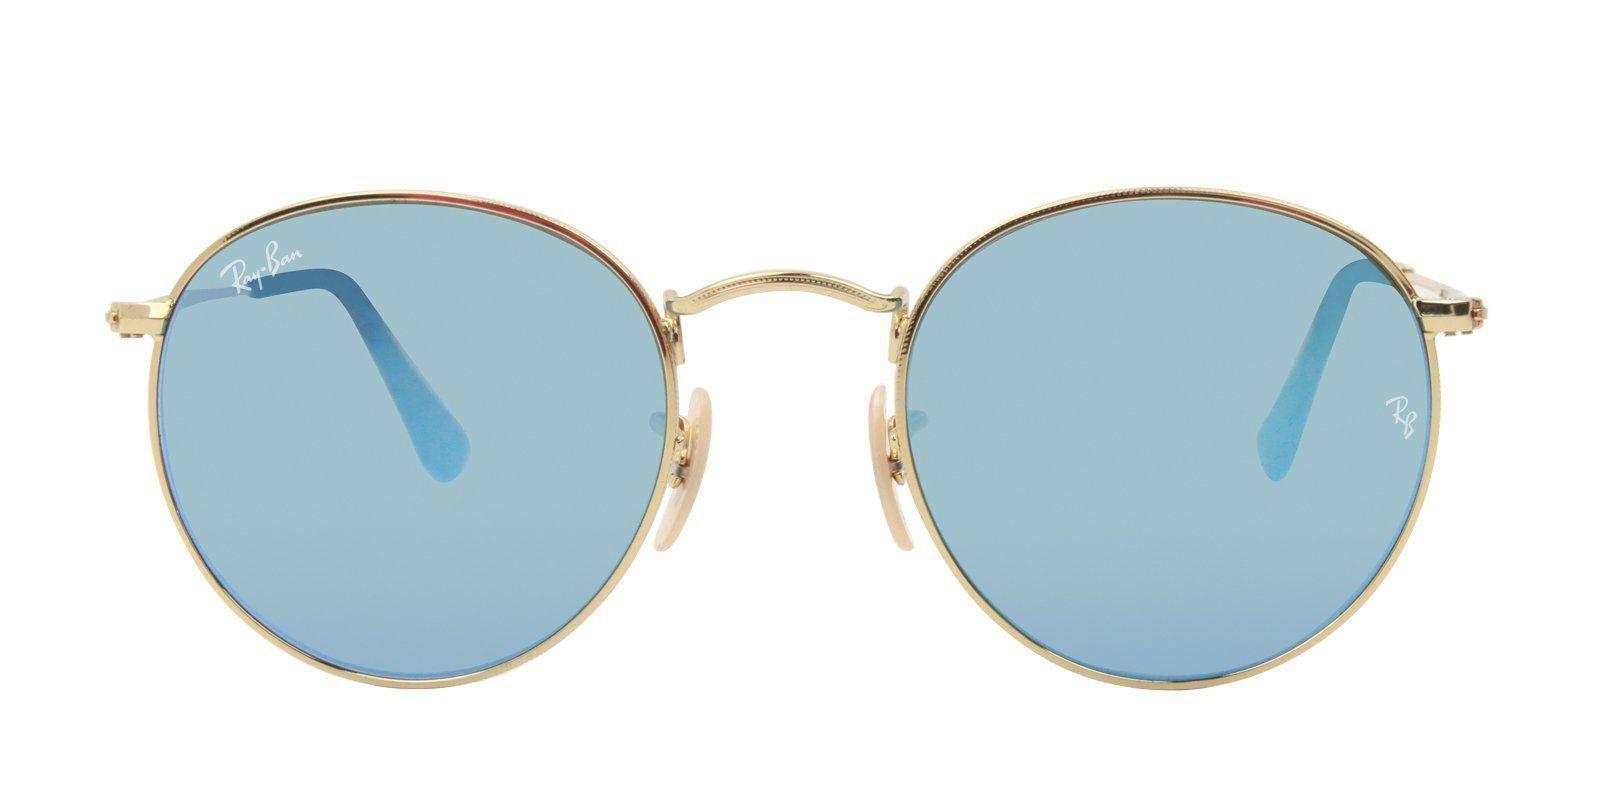 86e952b350 Ray Ban - Round Metal Gold - Blue sunglasses– Designer Eyes